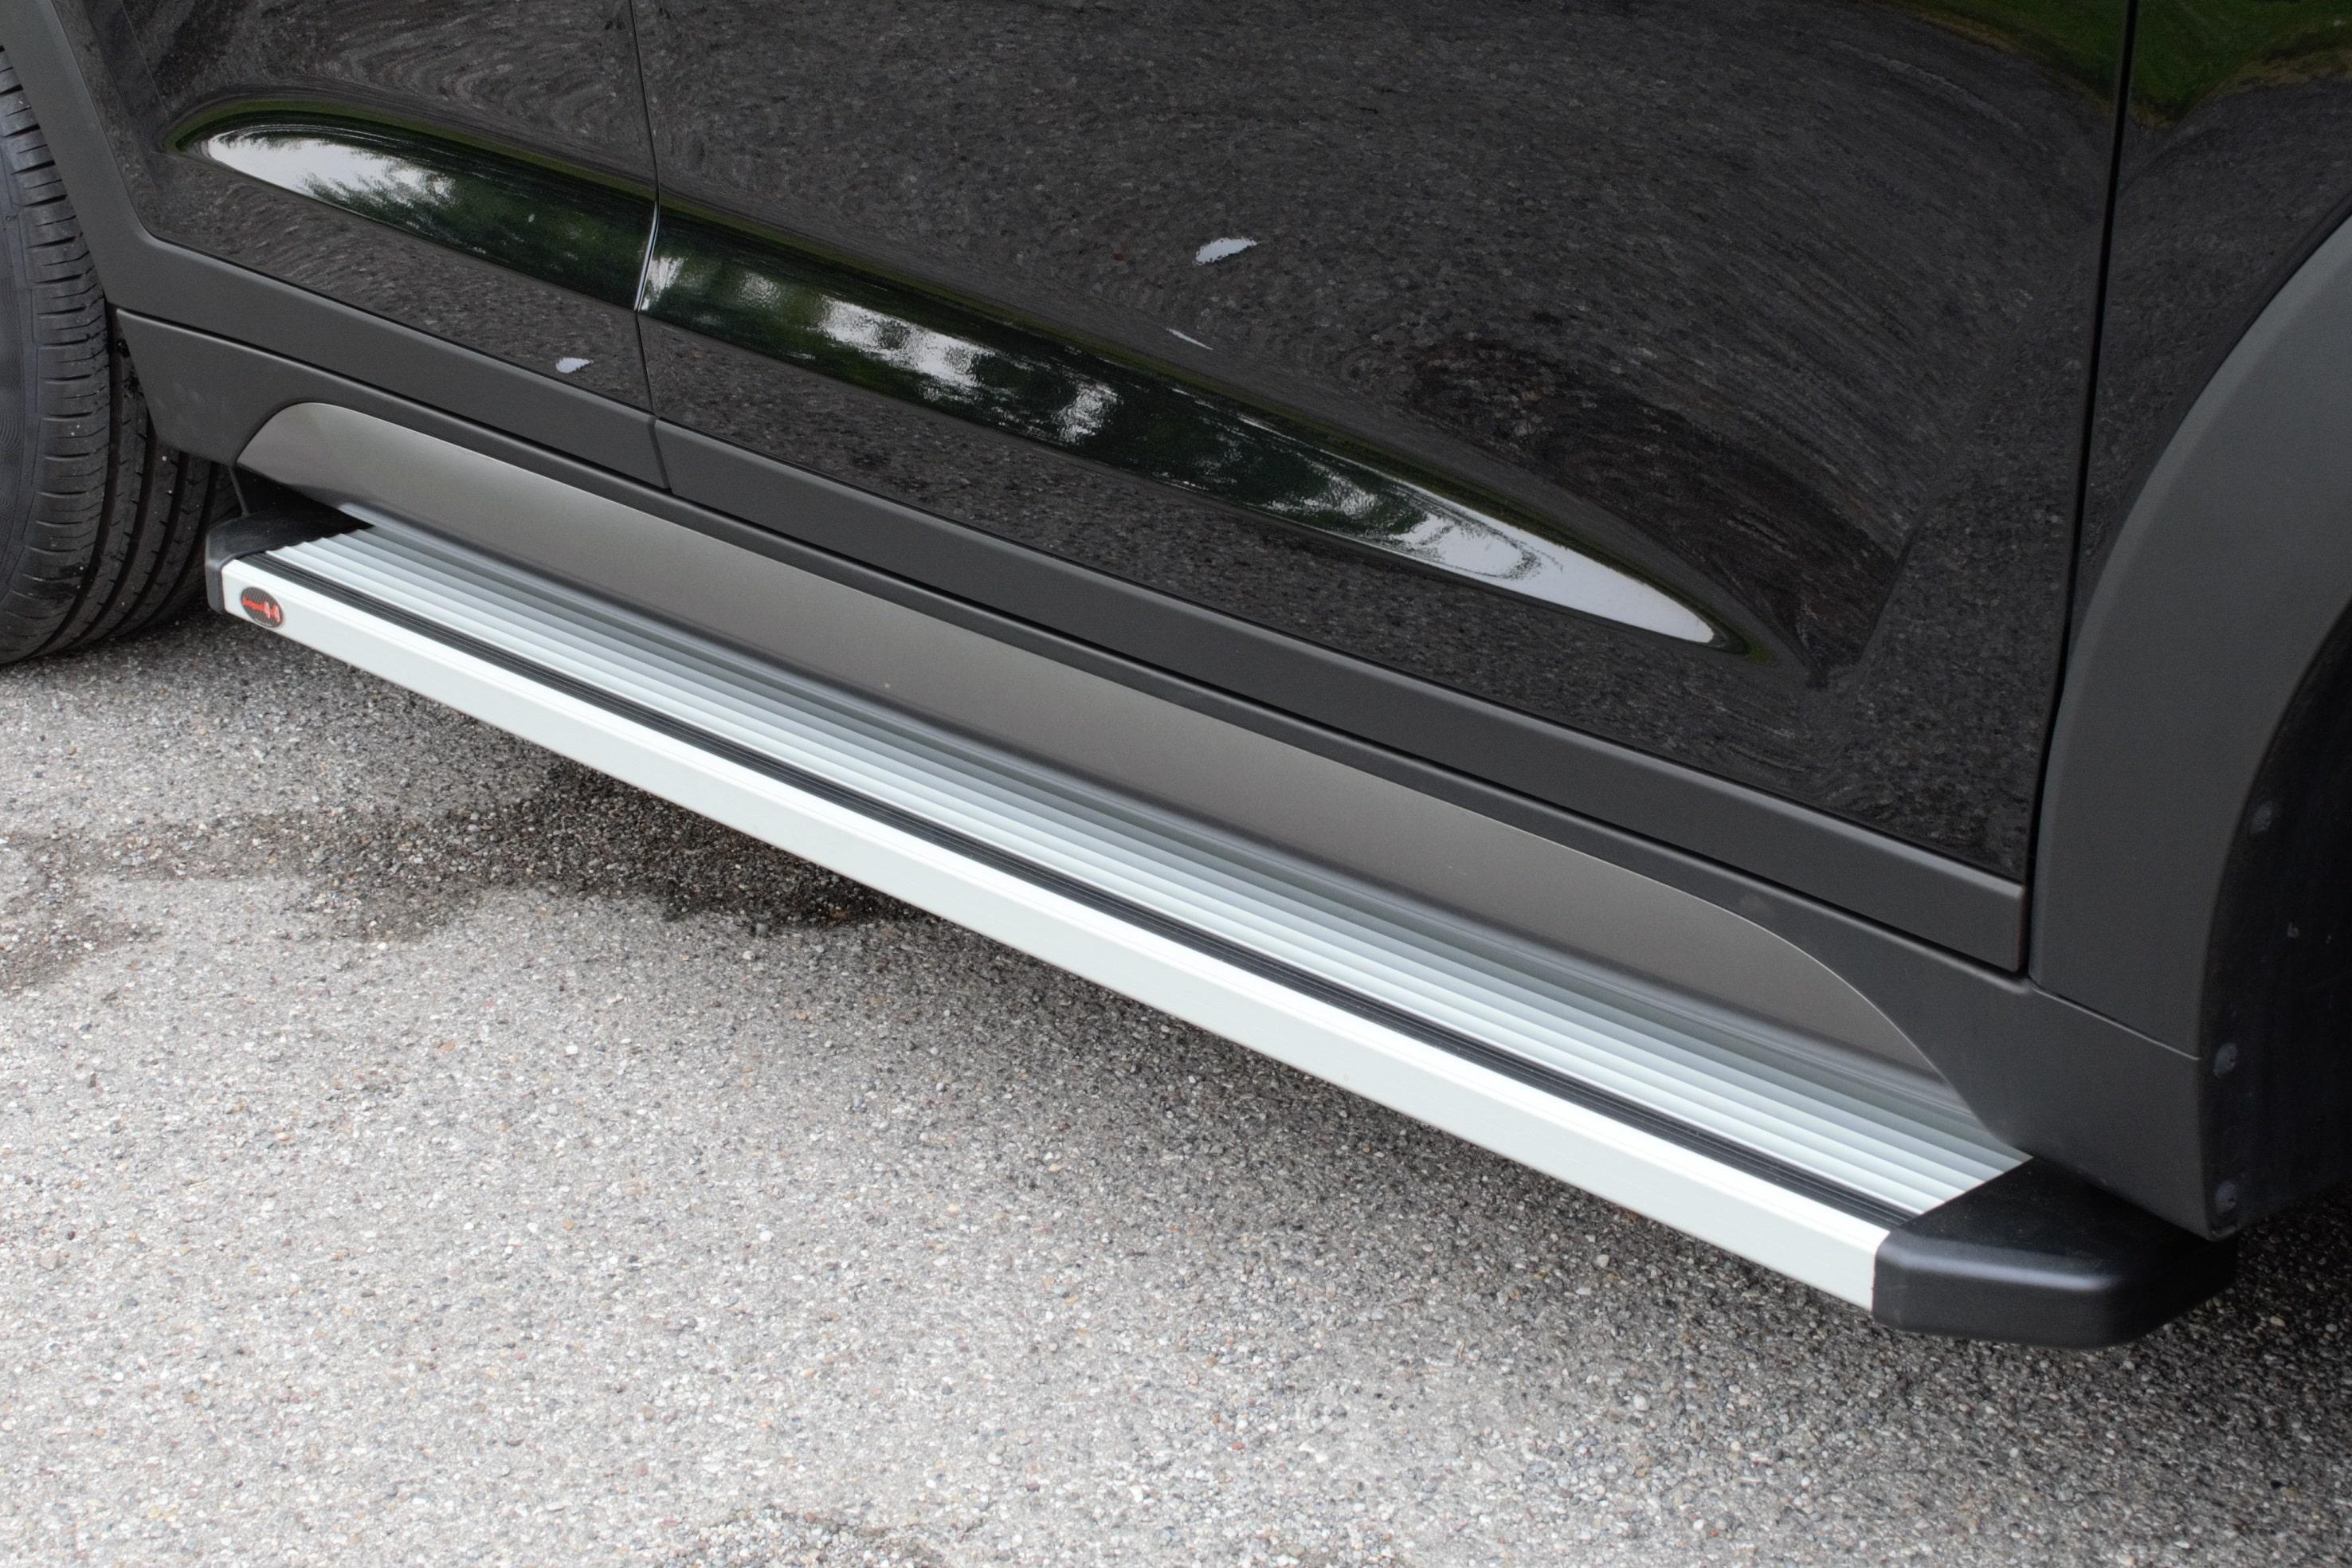 NOVISAuto Trittbretter Modell STD-R5